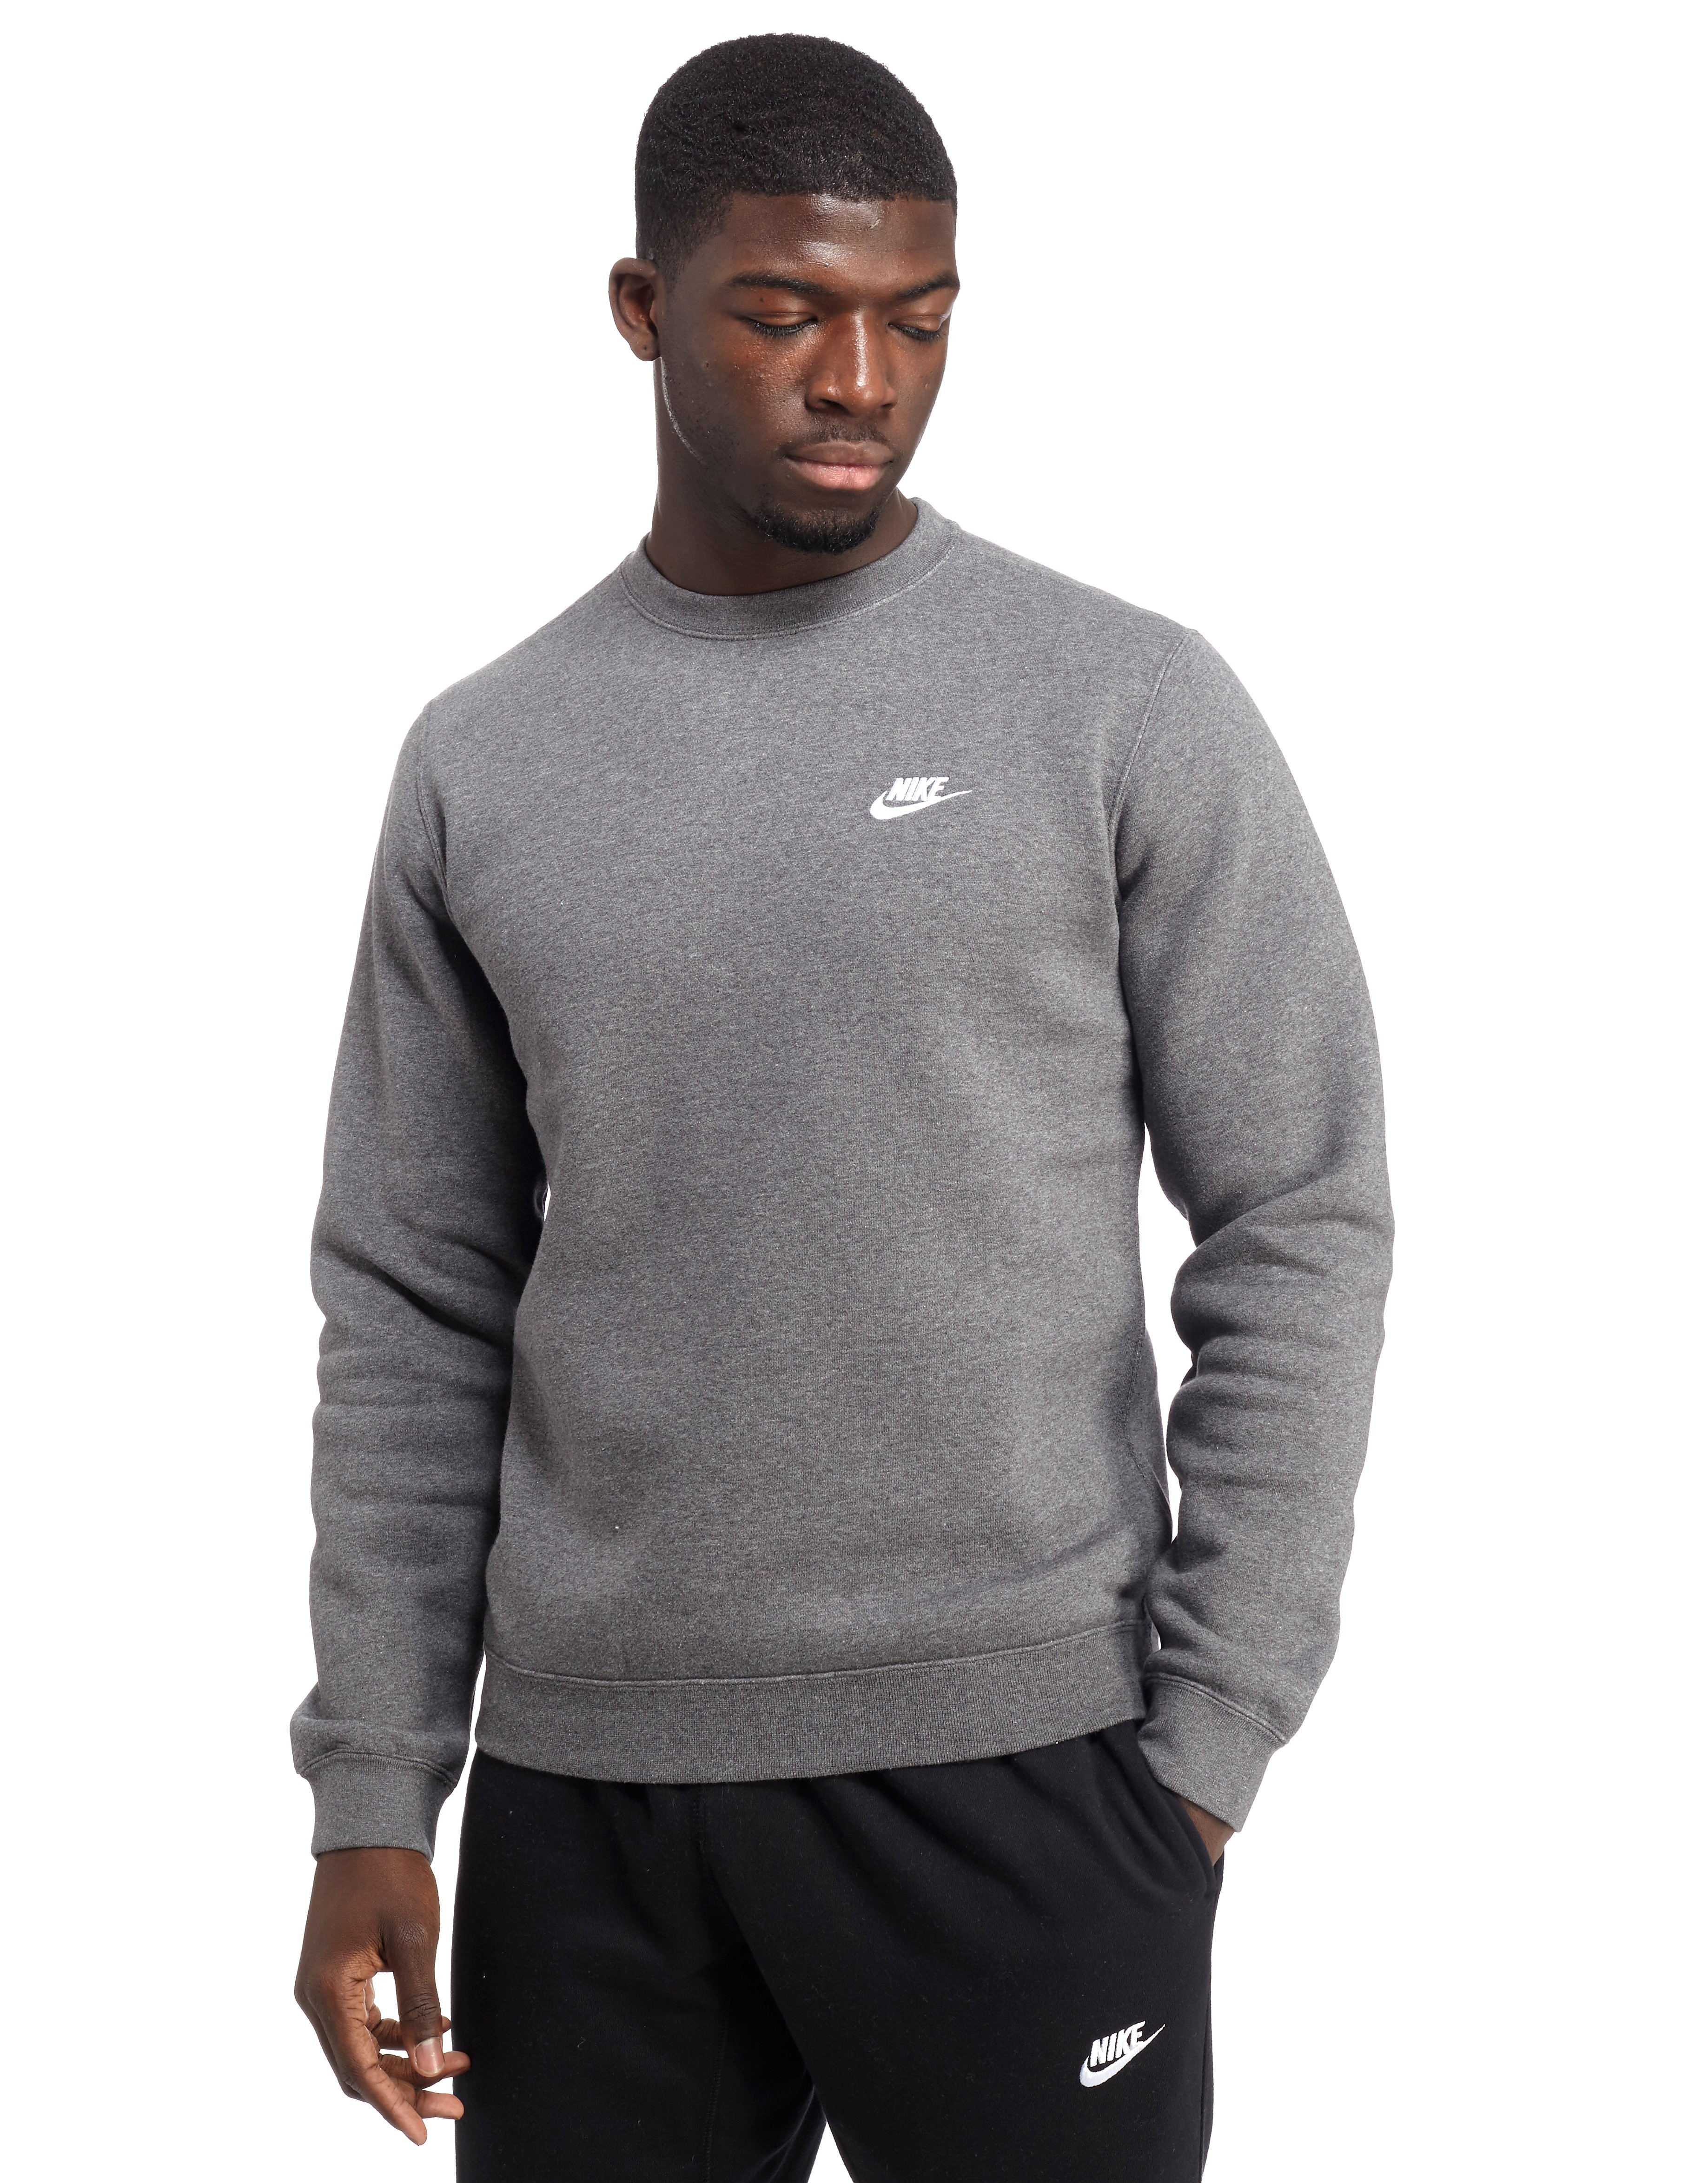 flotador Velocidad supersónica Goneryl  Nike Foundation Crew Sweatshirt - Charcoal - Mens - Sports King Store